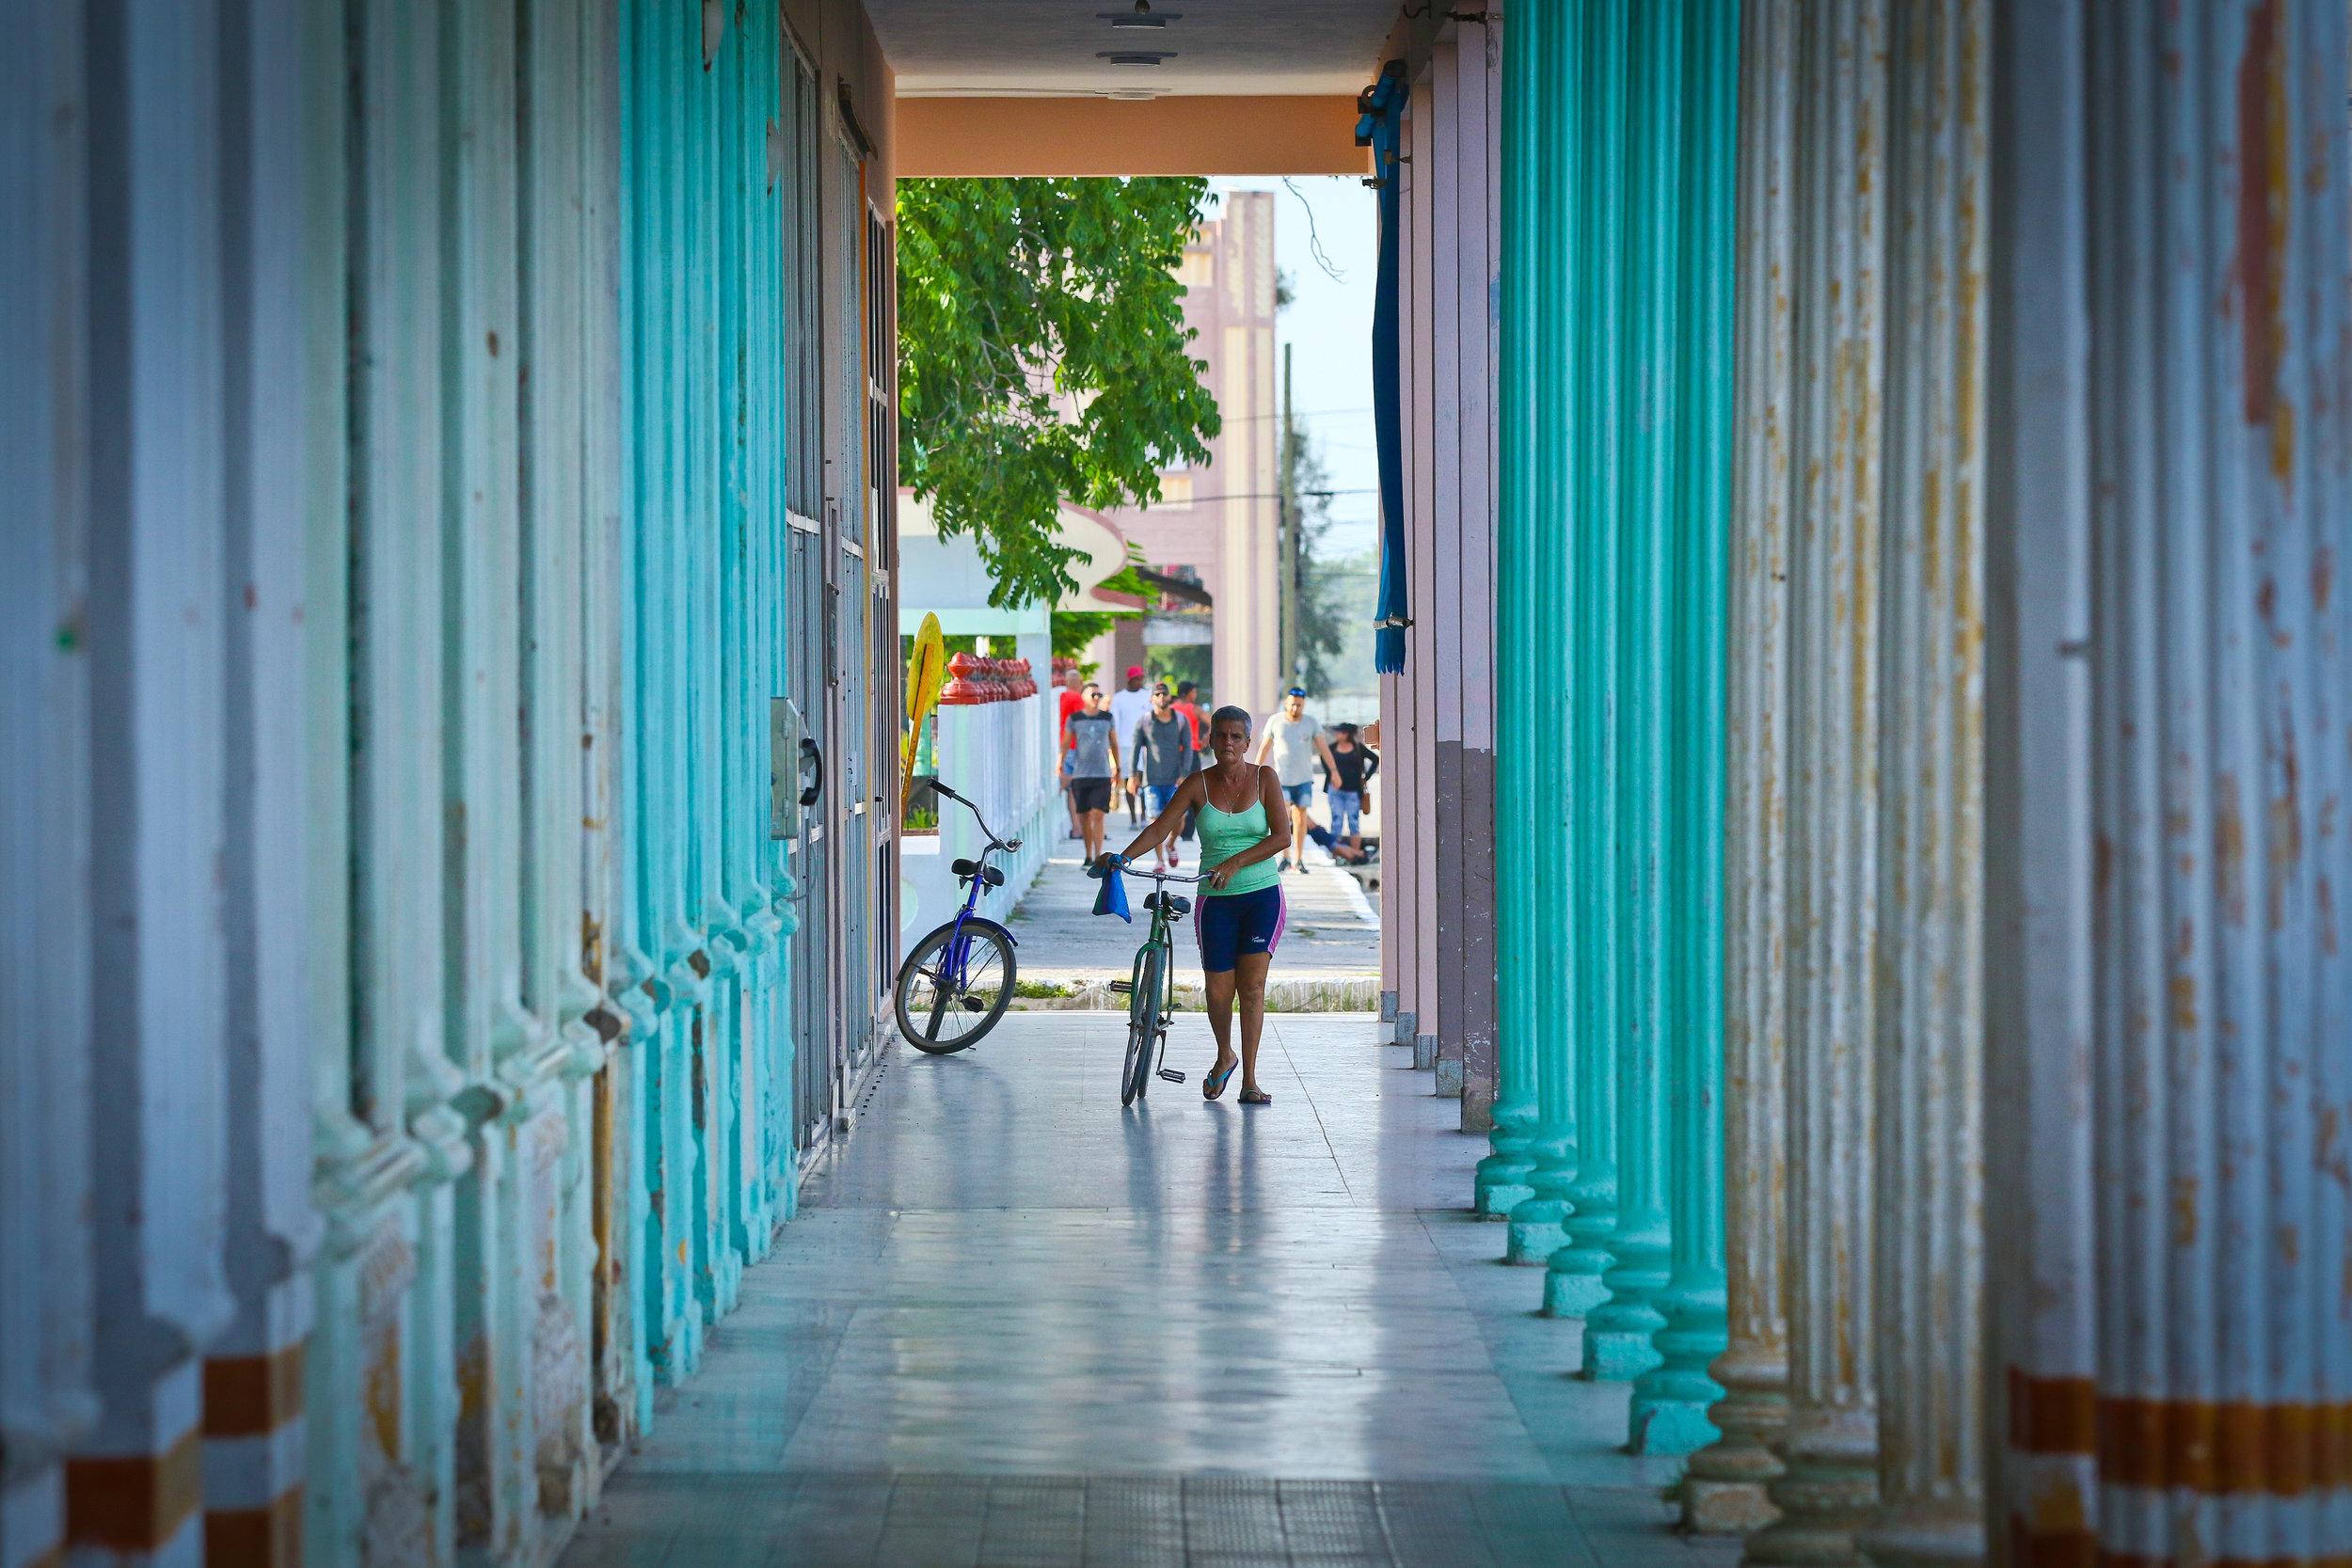 The colors of Cuba in a Havana neighborhood